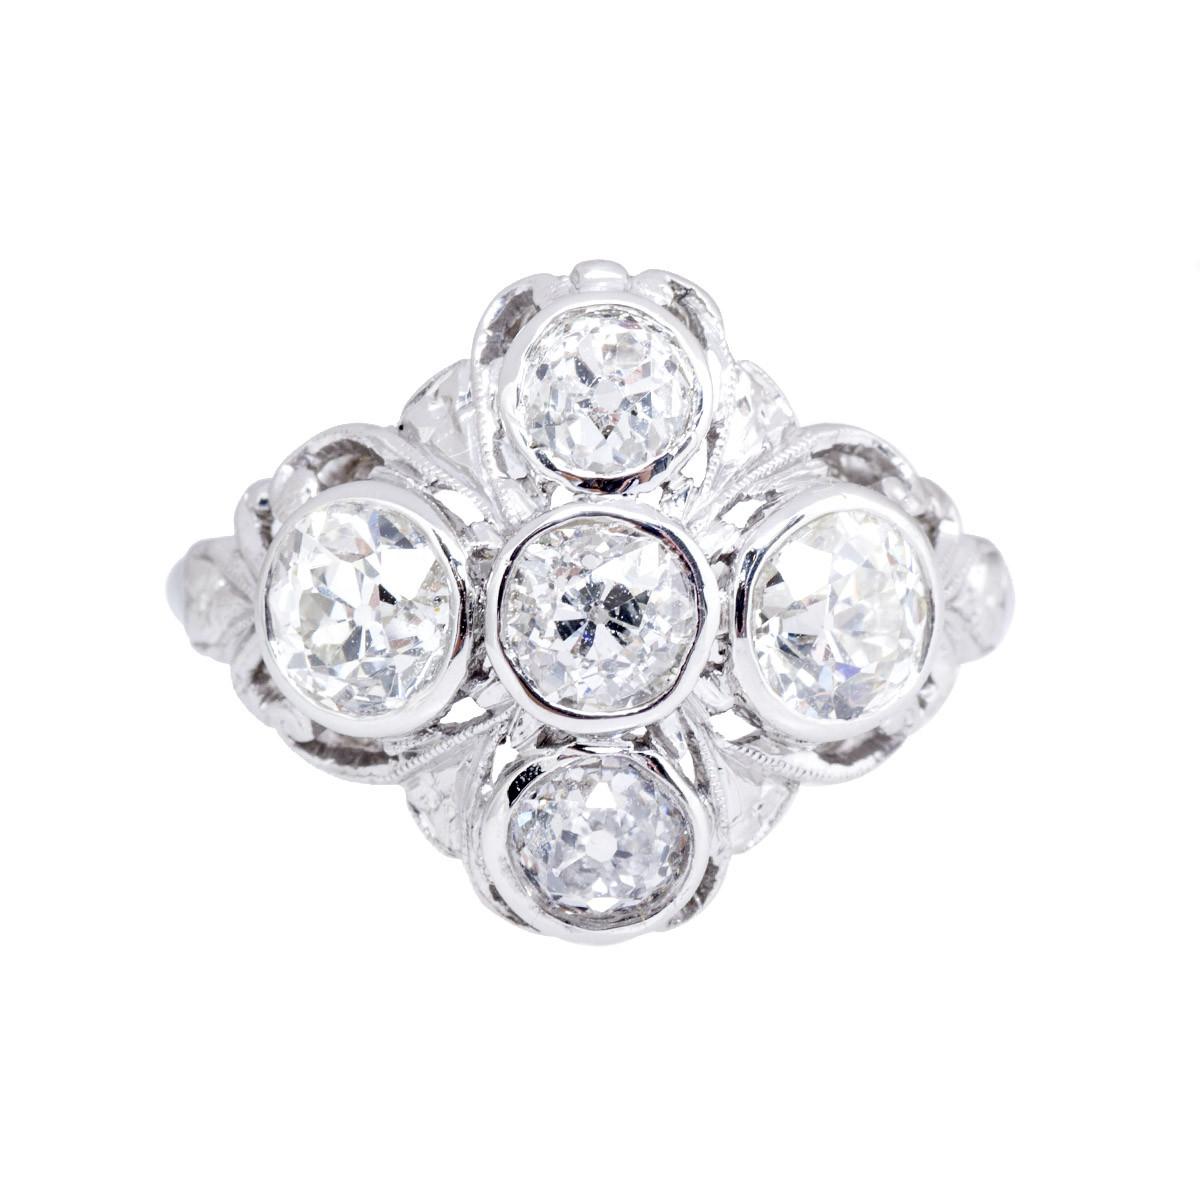 Antique Edwardian 2.25 CTW Diamond Ring